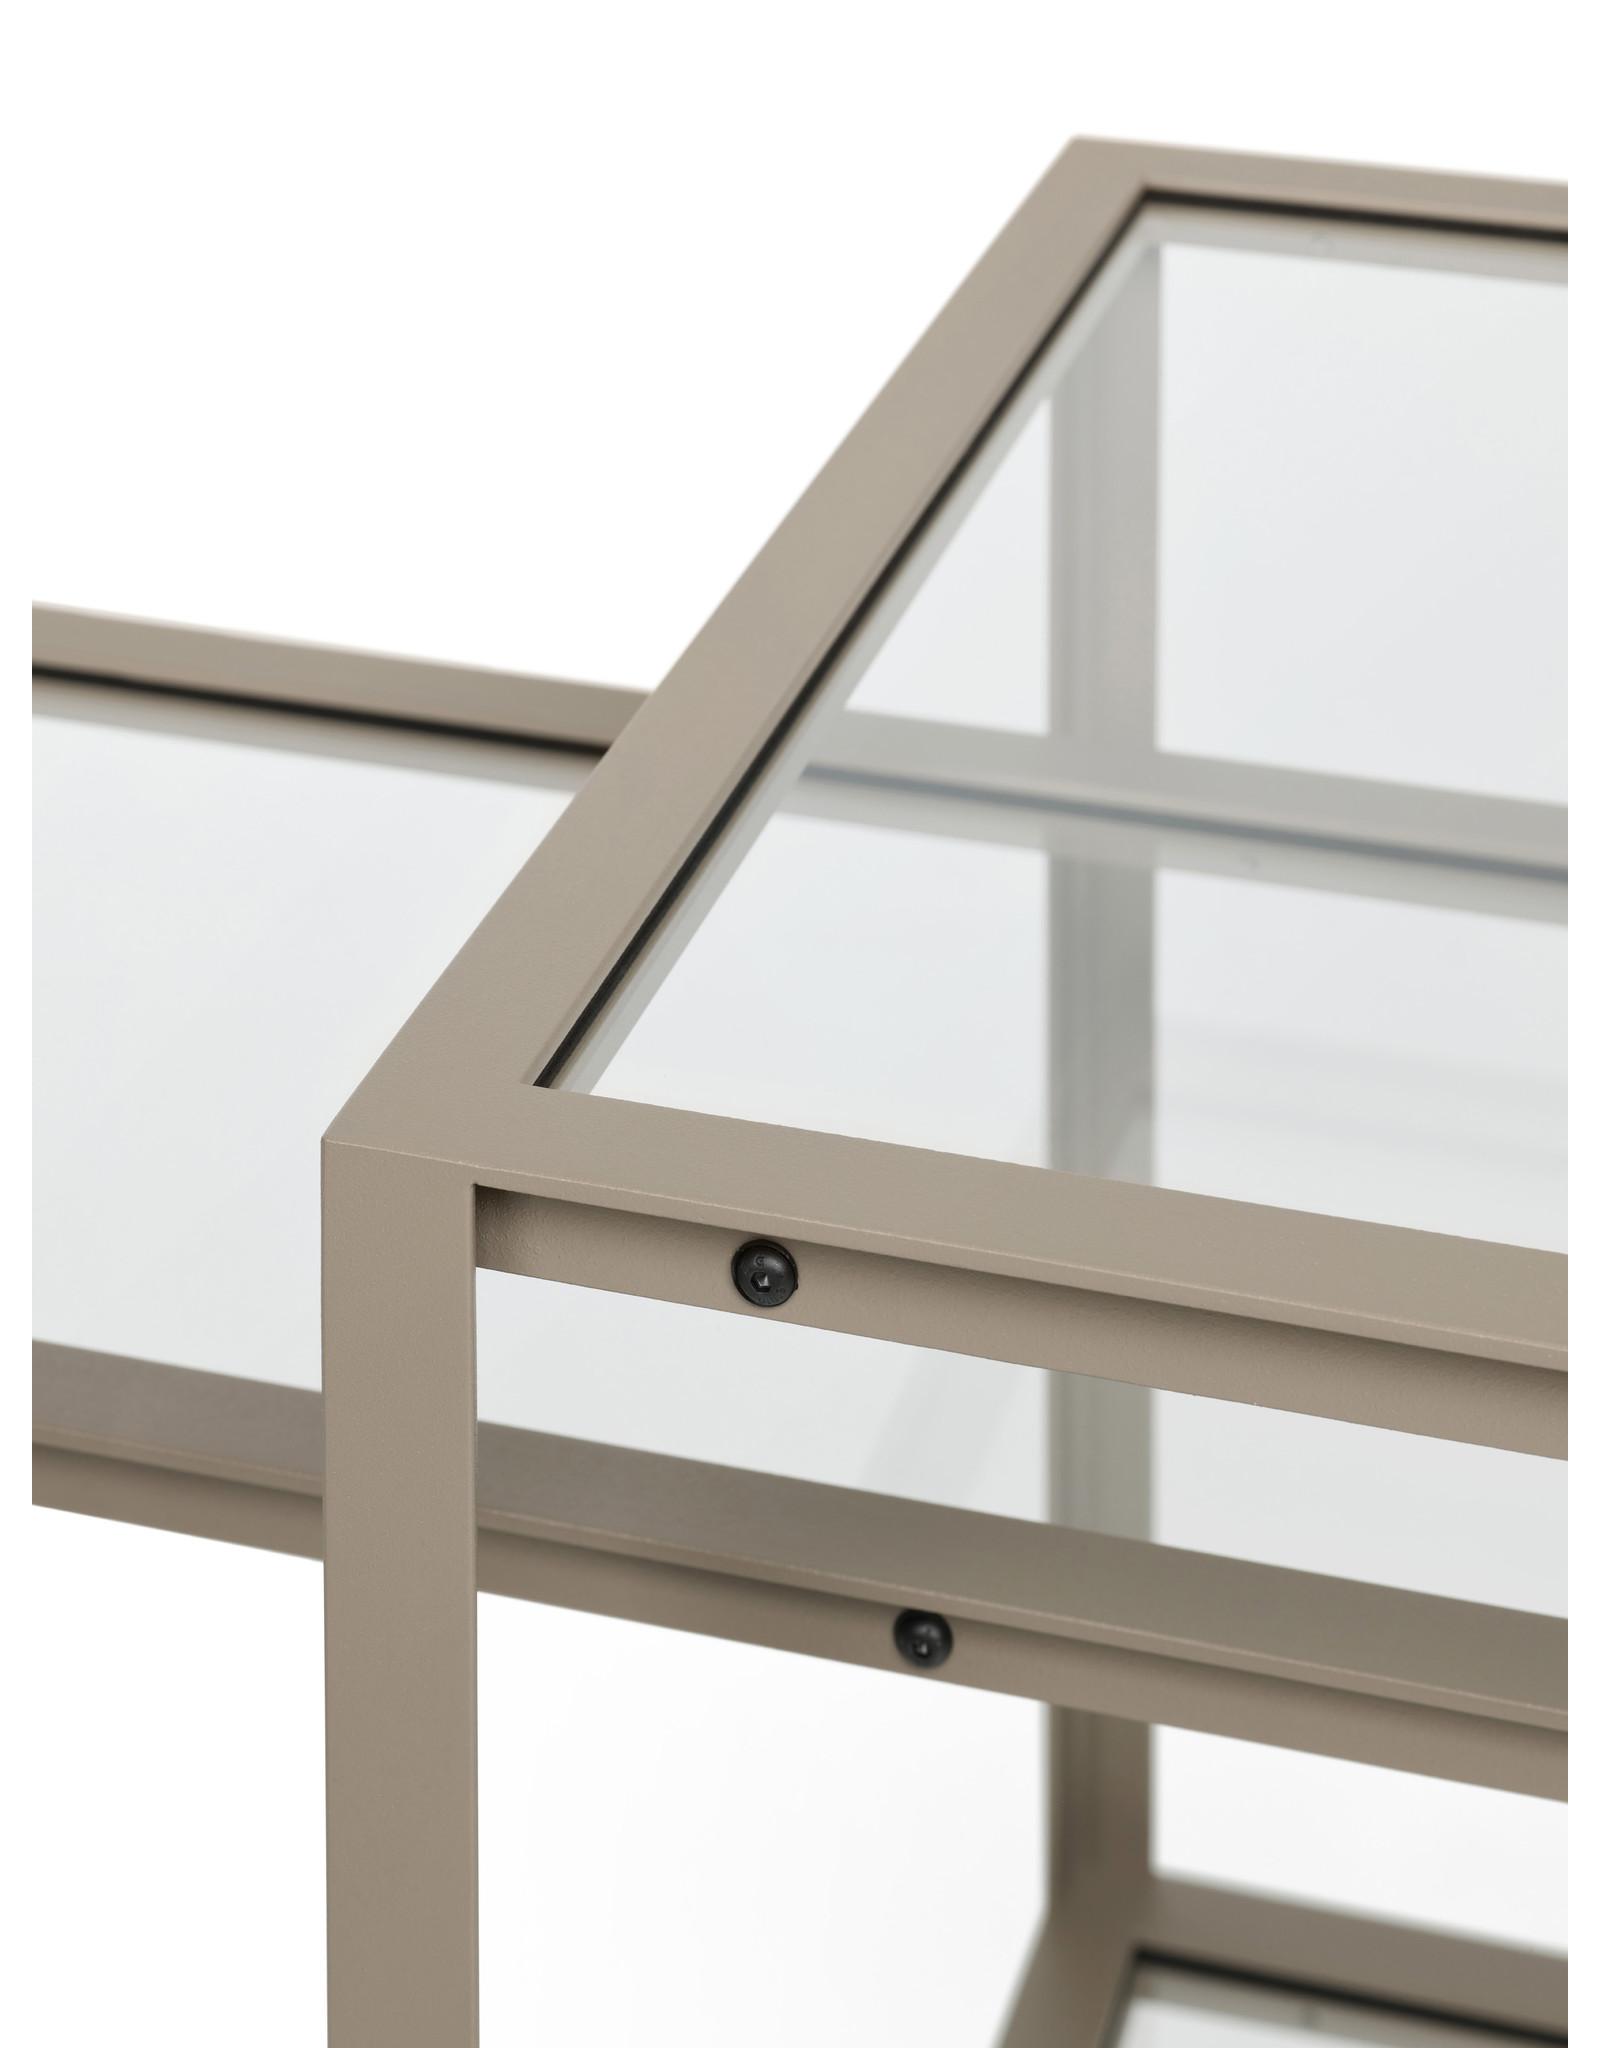 Spectrum design Tangled dressoir (taupe) voor Spectrum